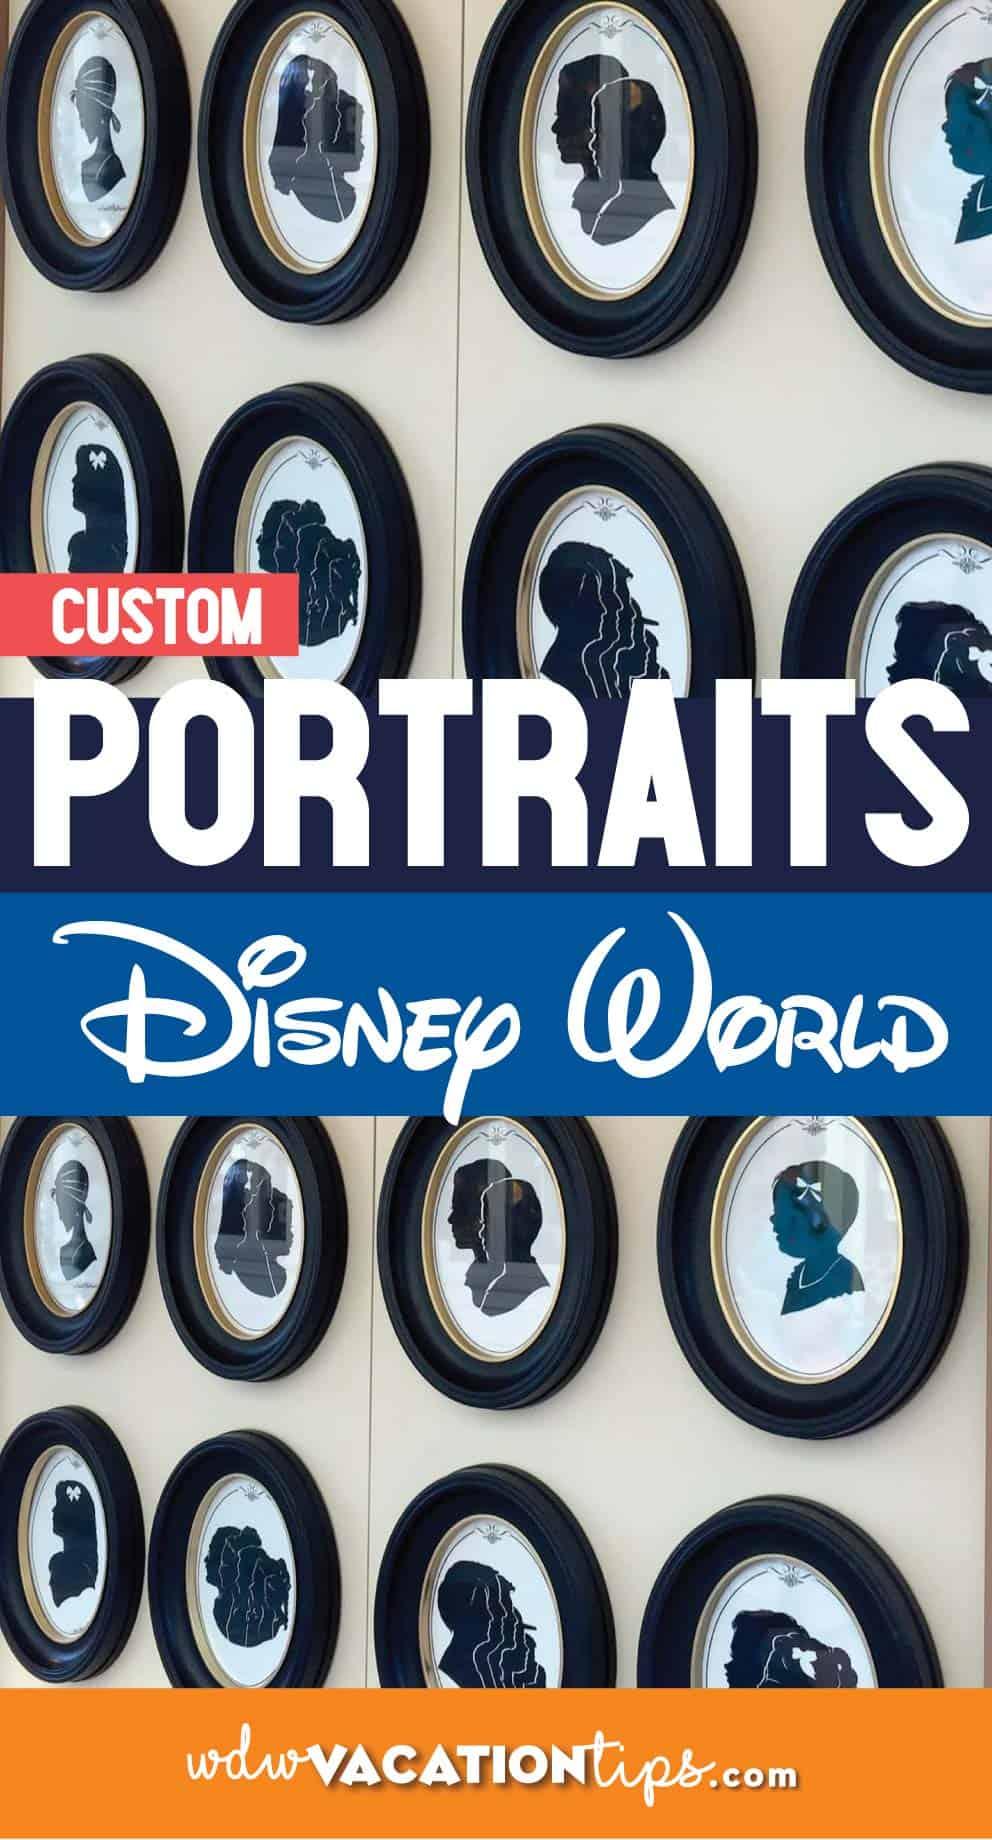 Disney World portraits